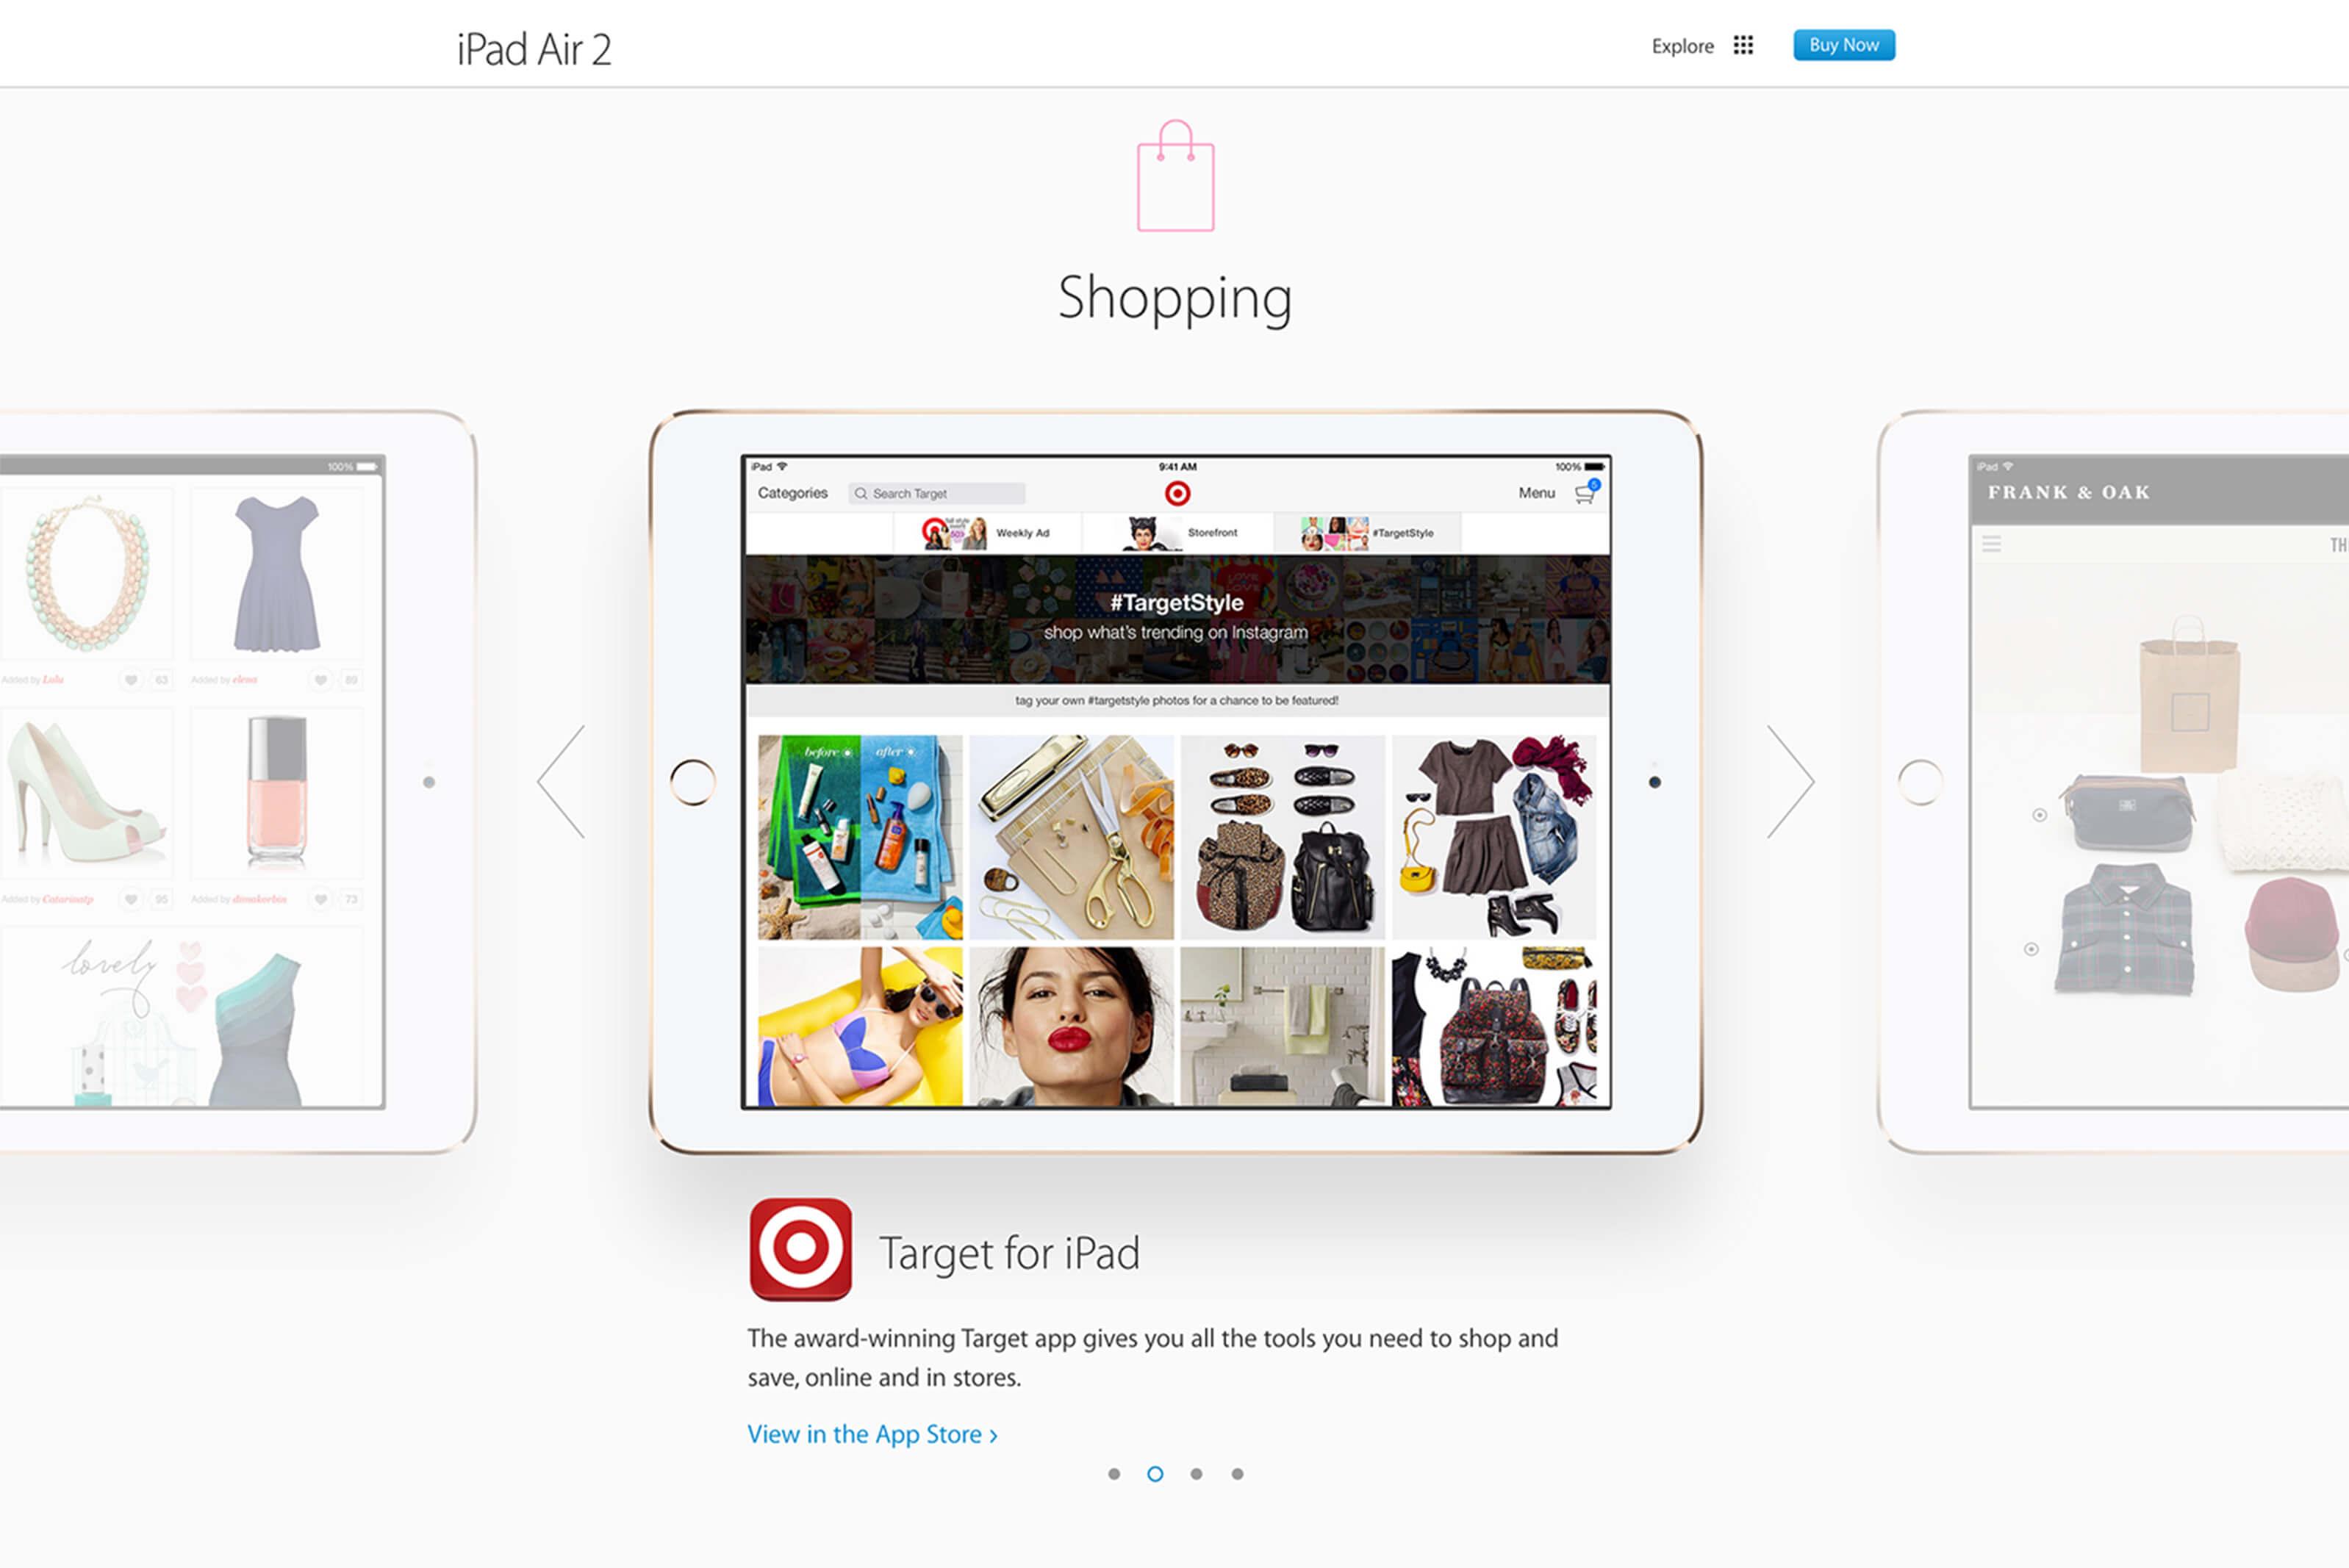 Target-Ipad-AppleStore@2x